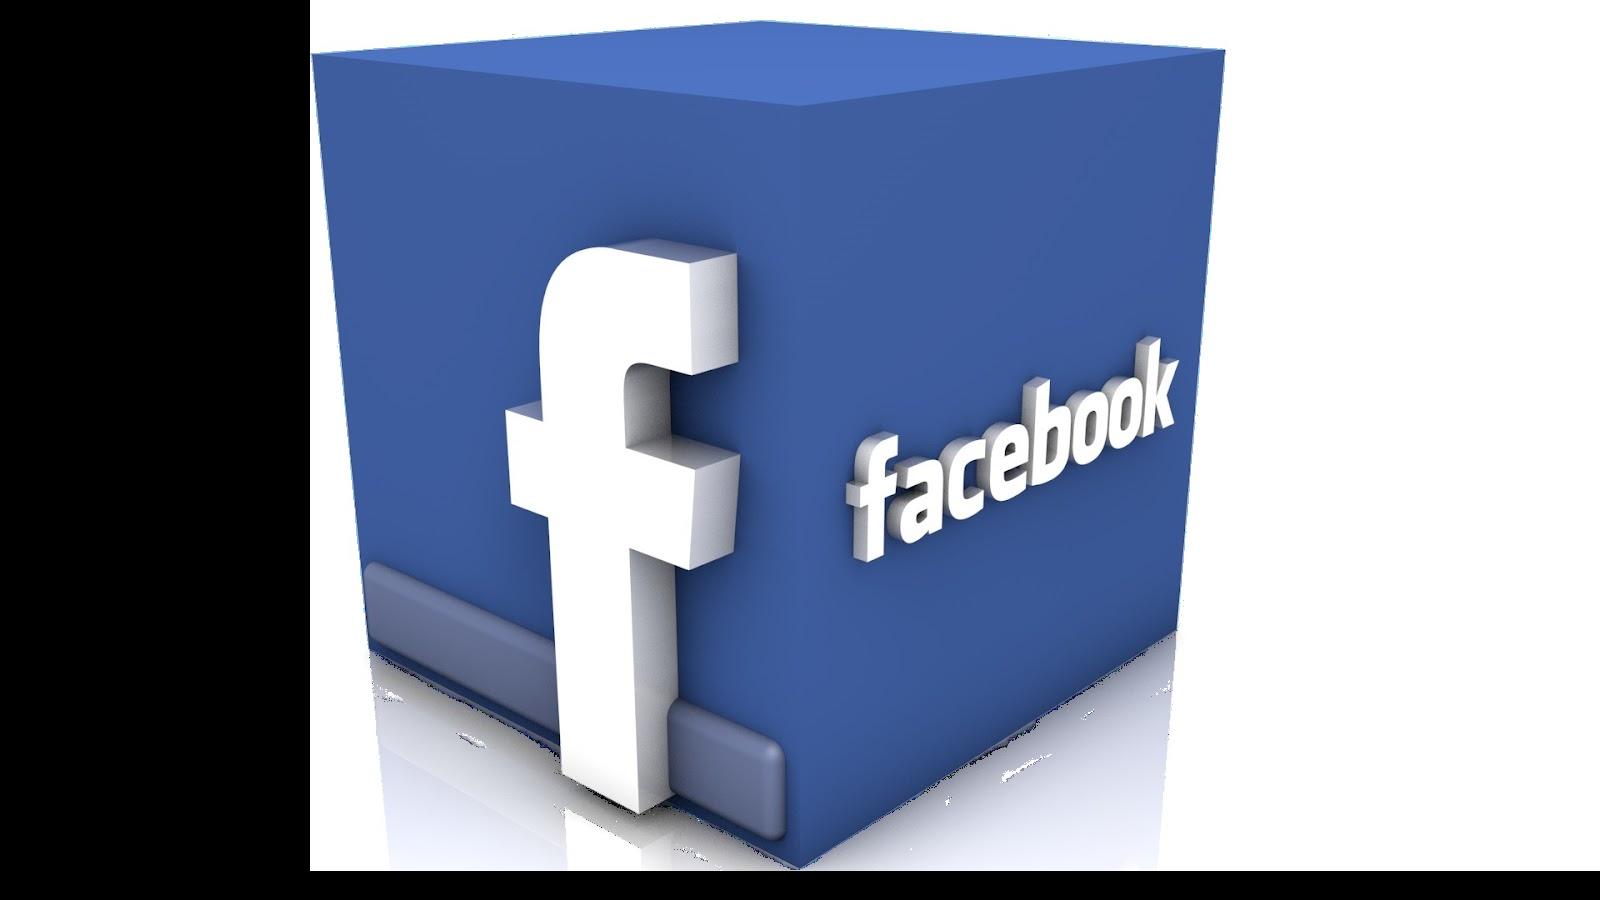 latest fb icon. Facebook clipart logo